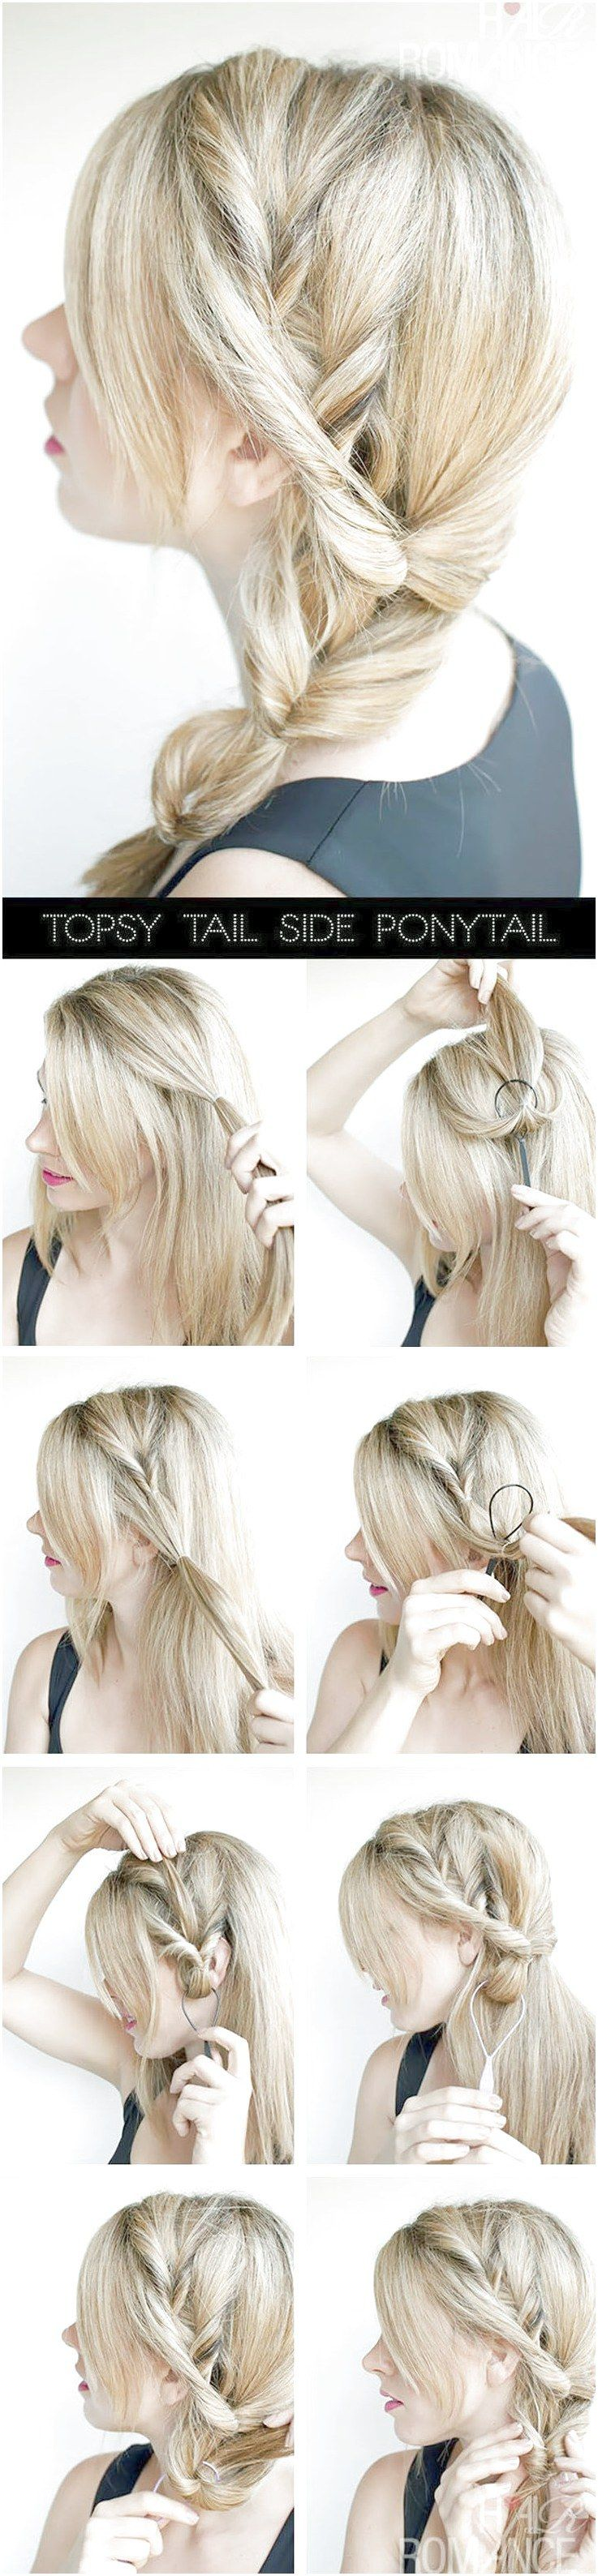 6 Easy & Pretty Prom Hairstyles   Hair romance, Long hair ...